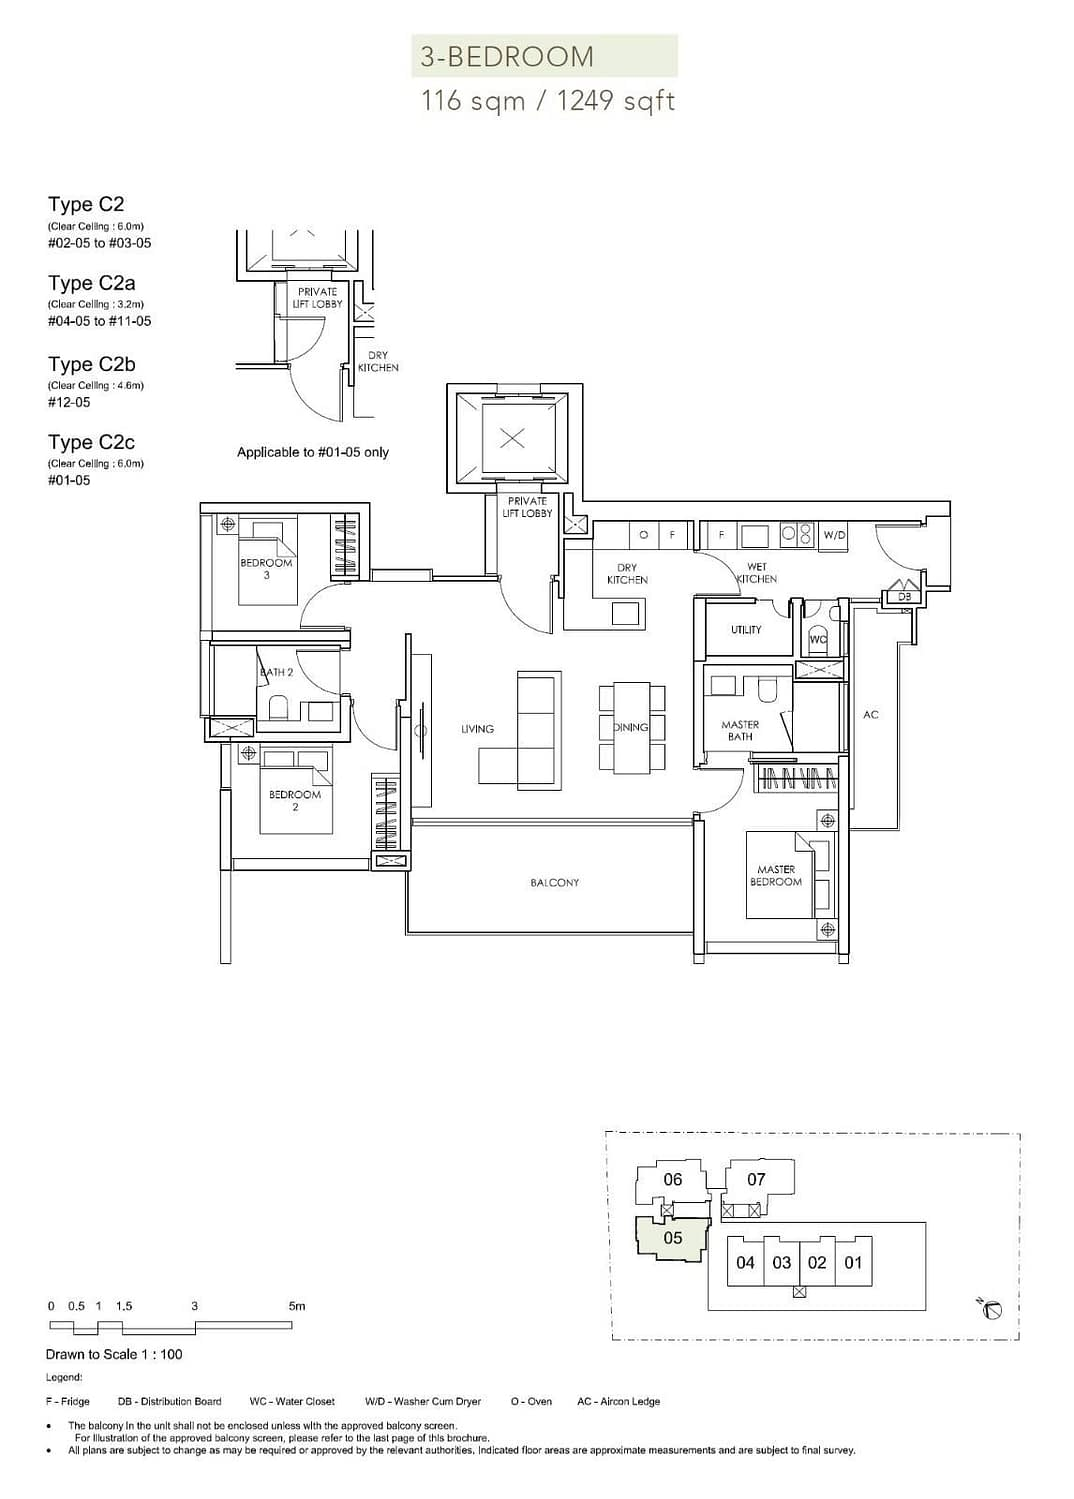 Sloane Residences Sloane Residences Floorplan C2c